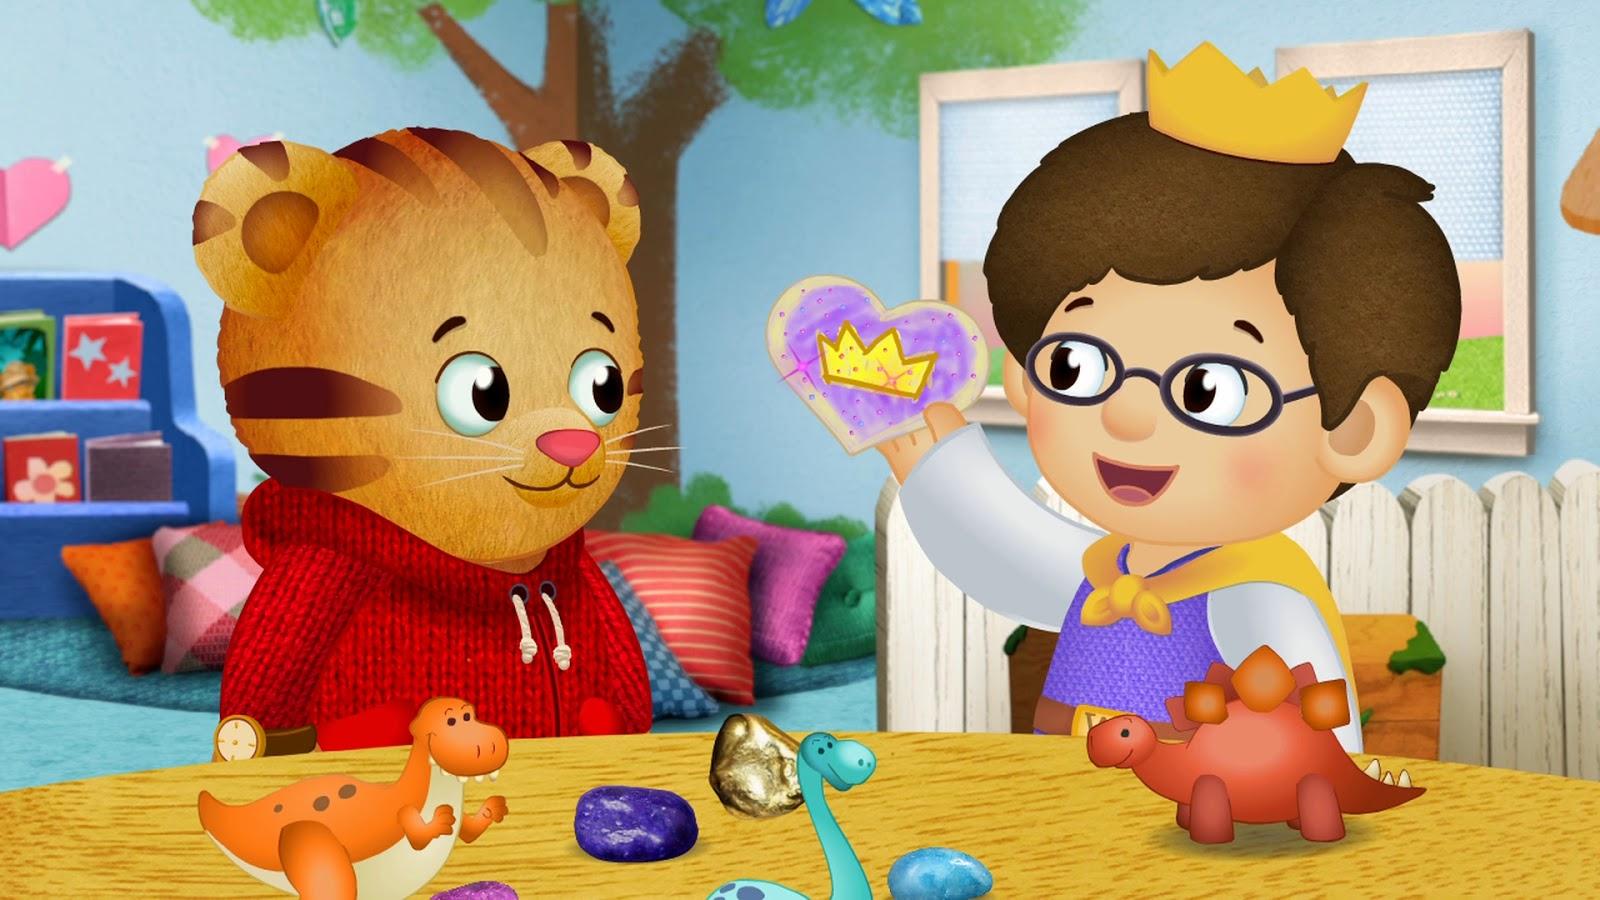 New Valentineu0027s Day Daniel Tigeru0027s Neighborhood Episode Premieres Monday,  2/9 On PBS KIDS!